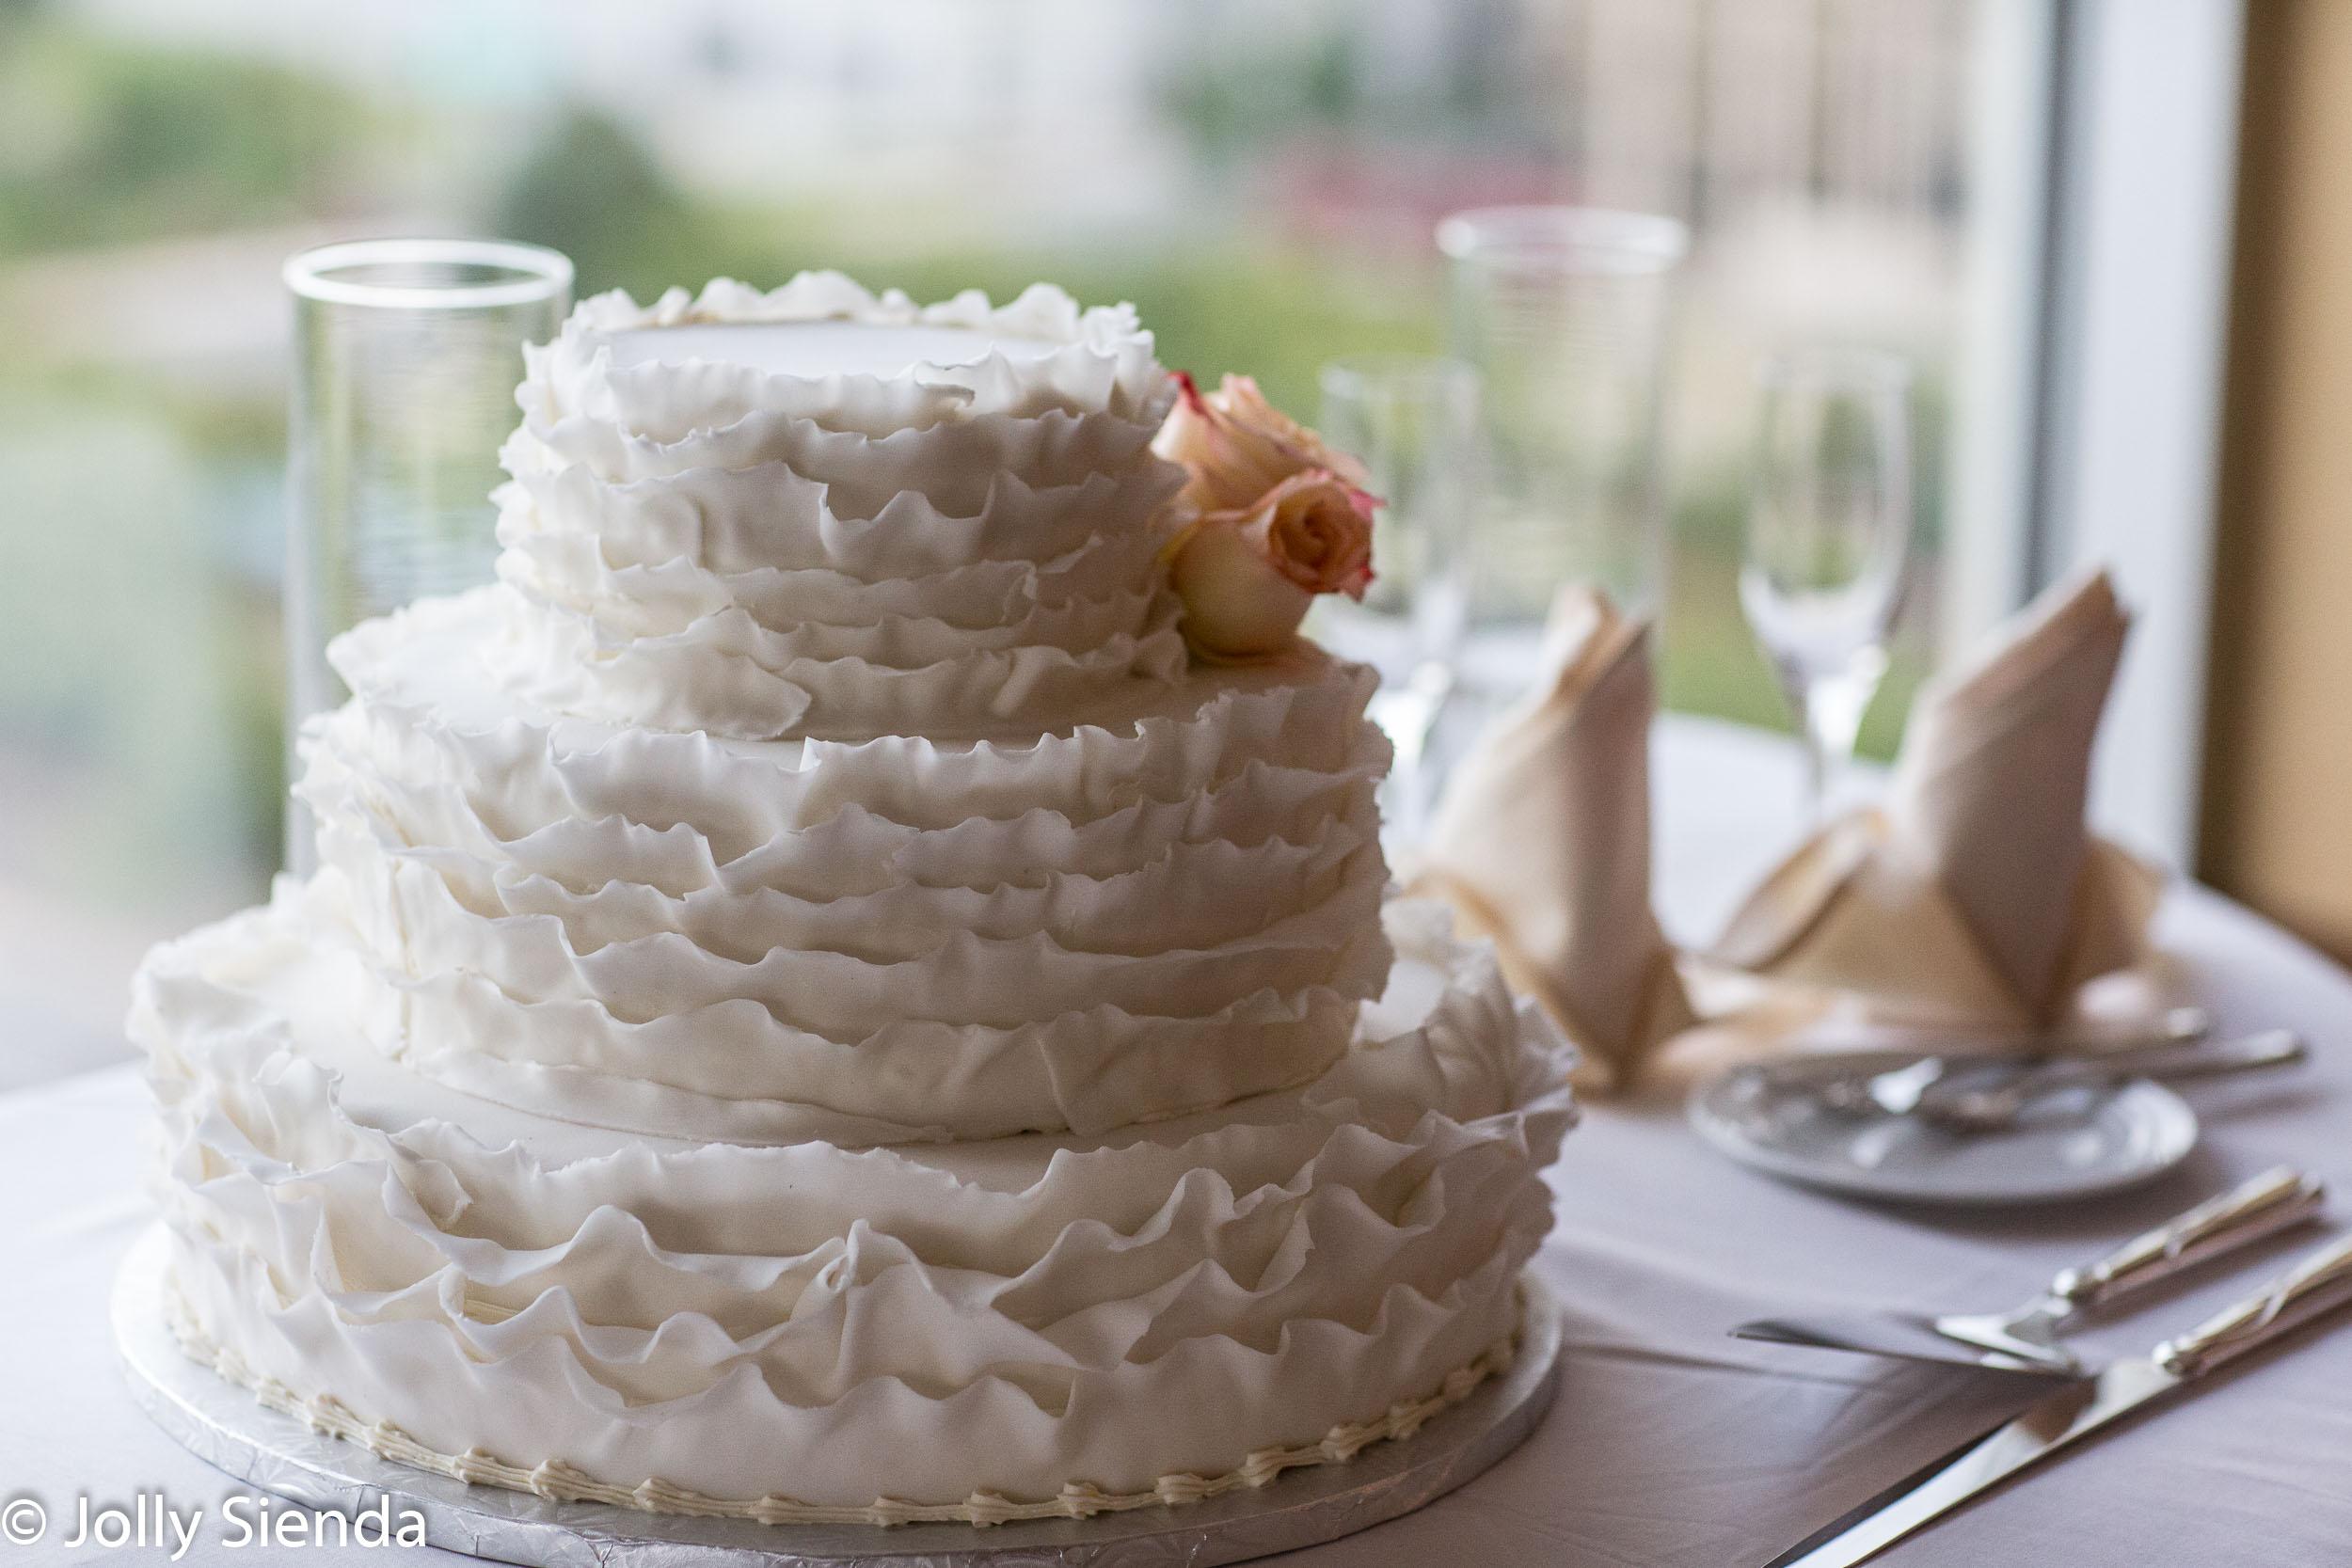 Three Tier White Chiffon Wedding Cake with Pale Peach Roses